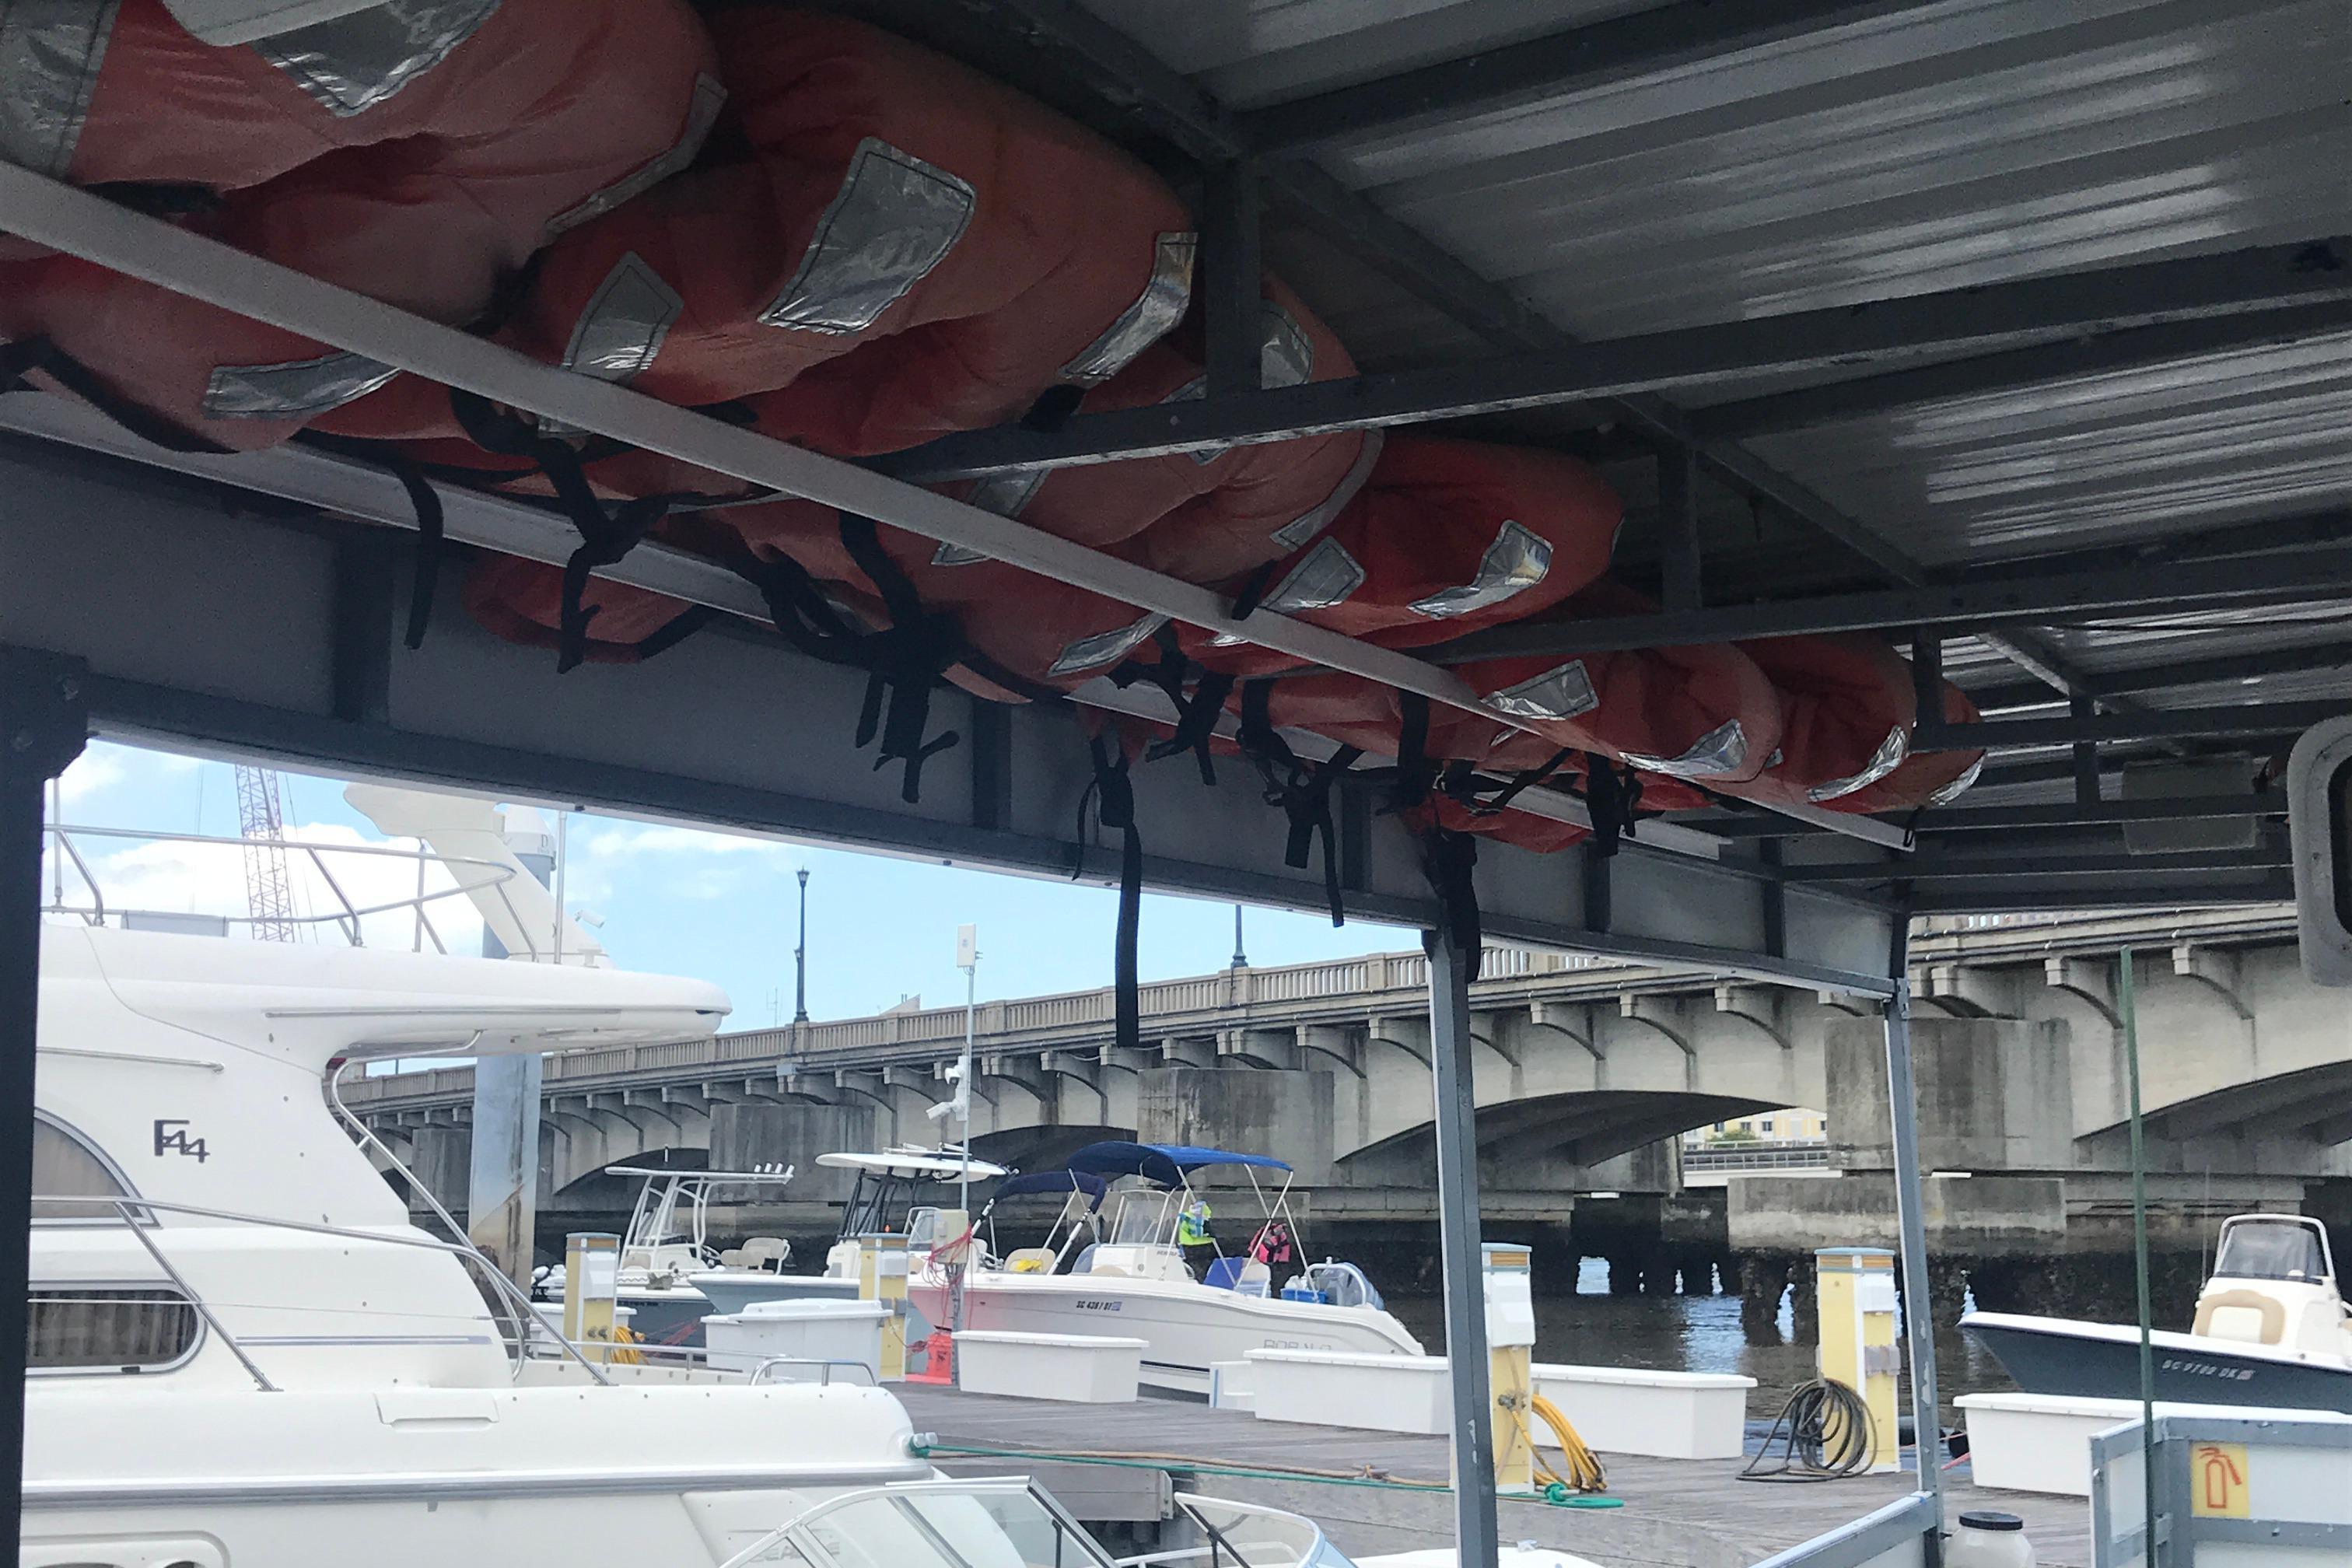 Southern Star 32 Commerical Catamaran - Port side overhead PFD storage